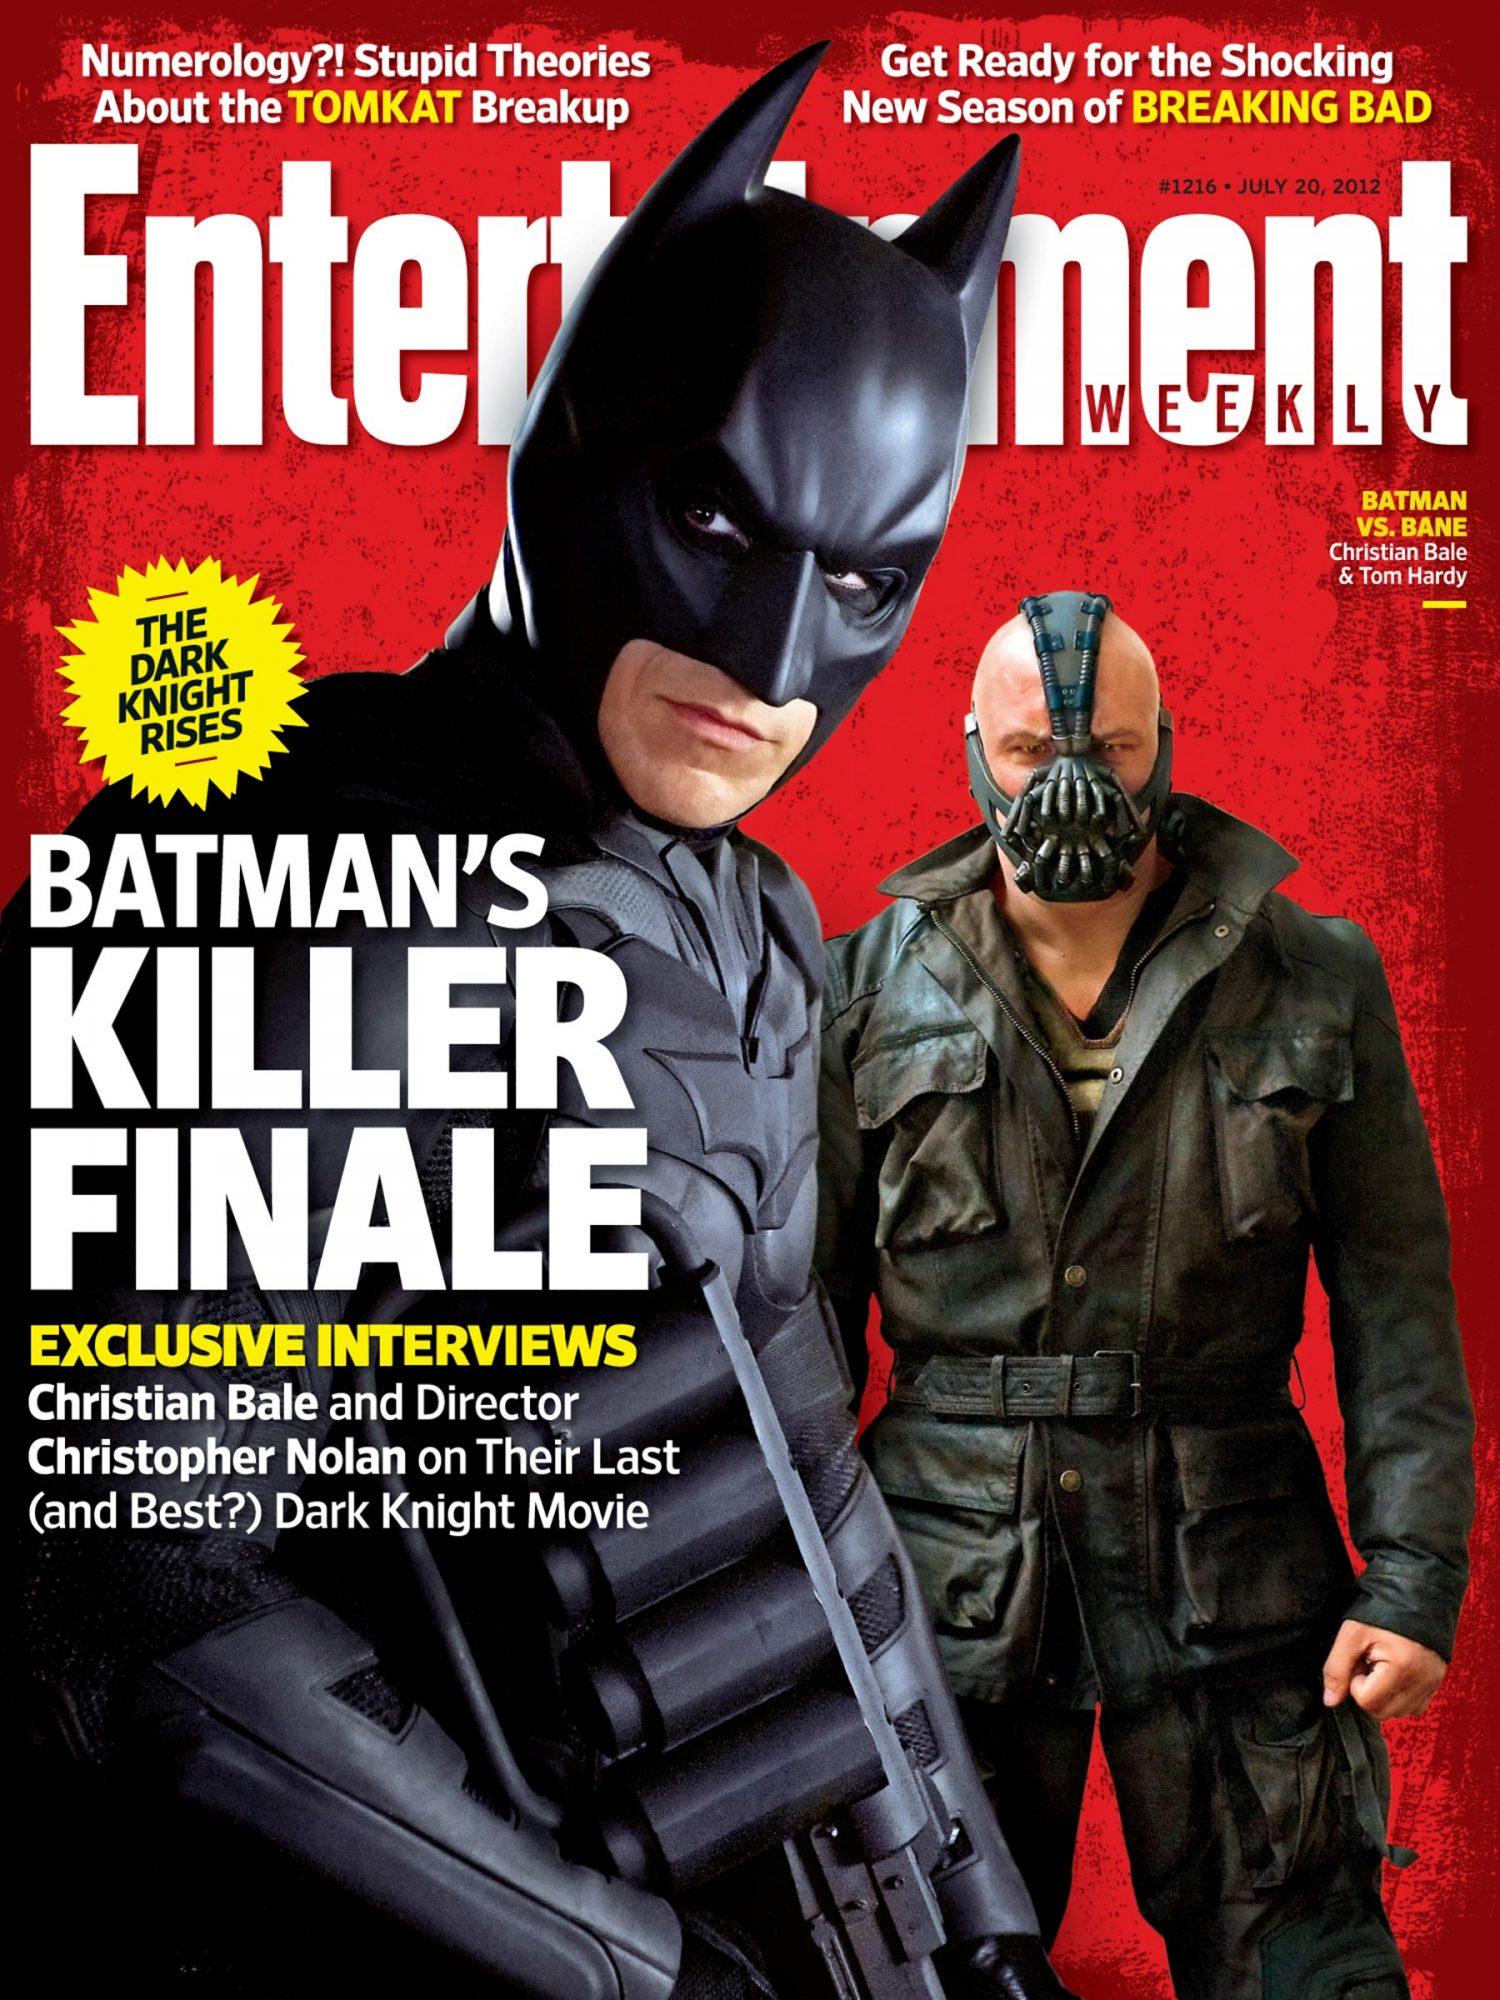 Entertainment Weekly Batman Dark Knight Rises Cover # 1216 July 20, 2012